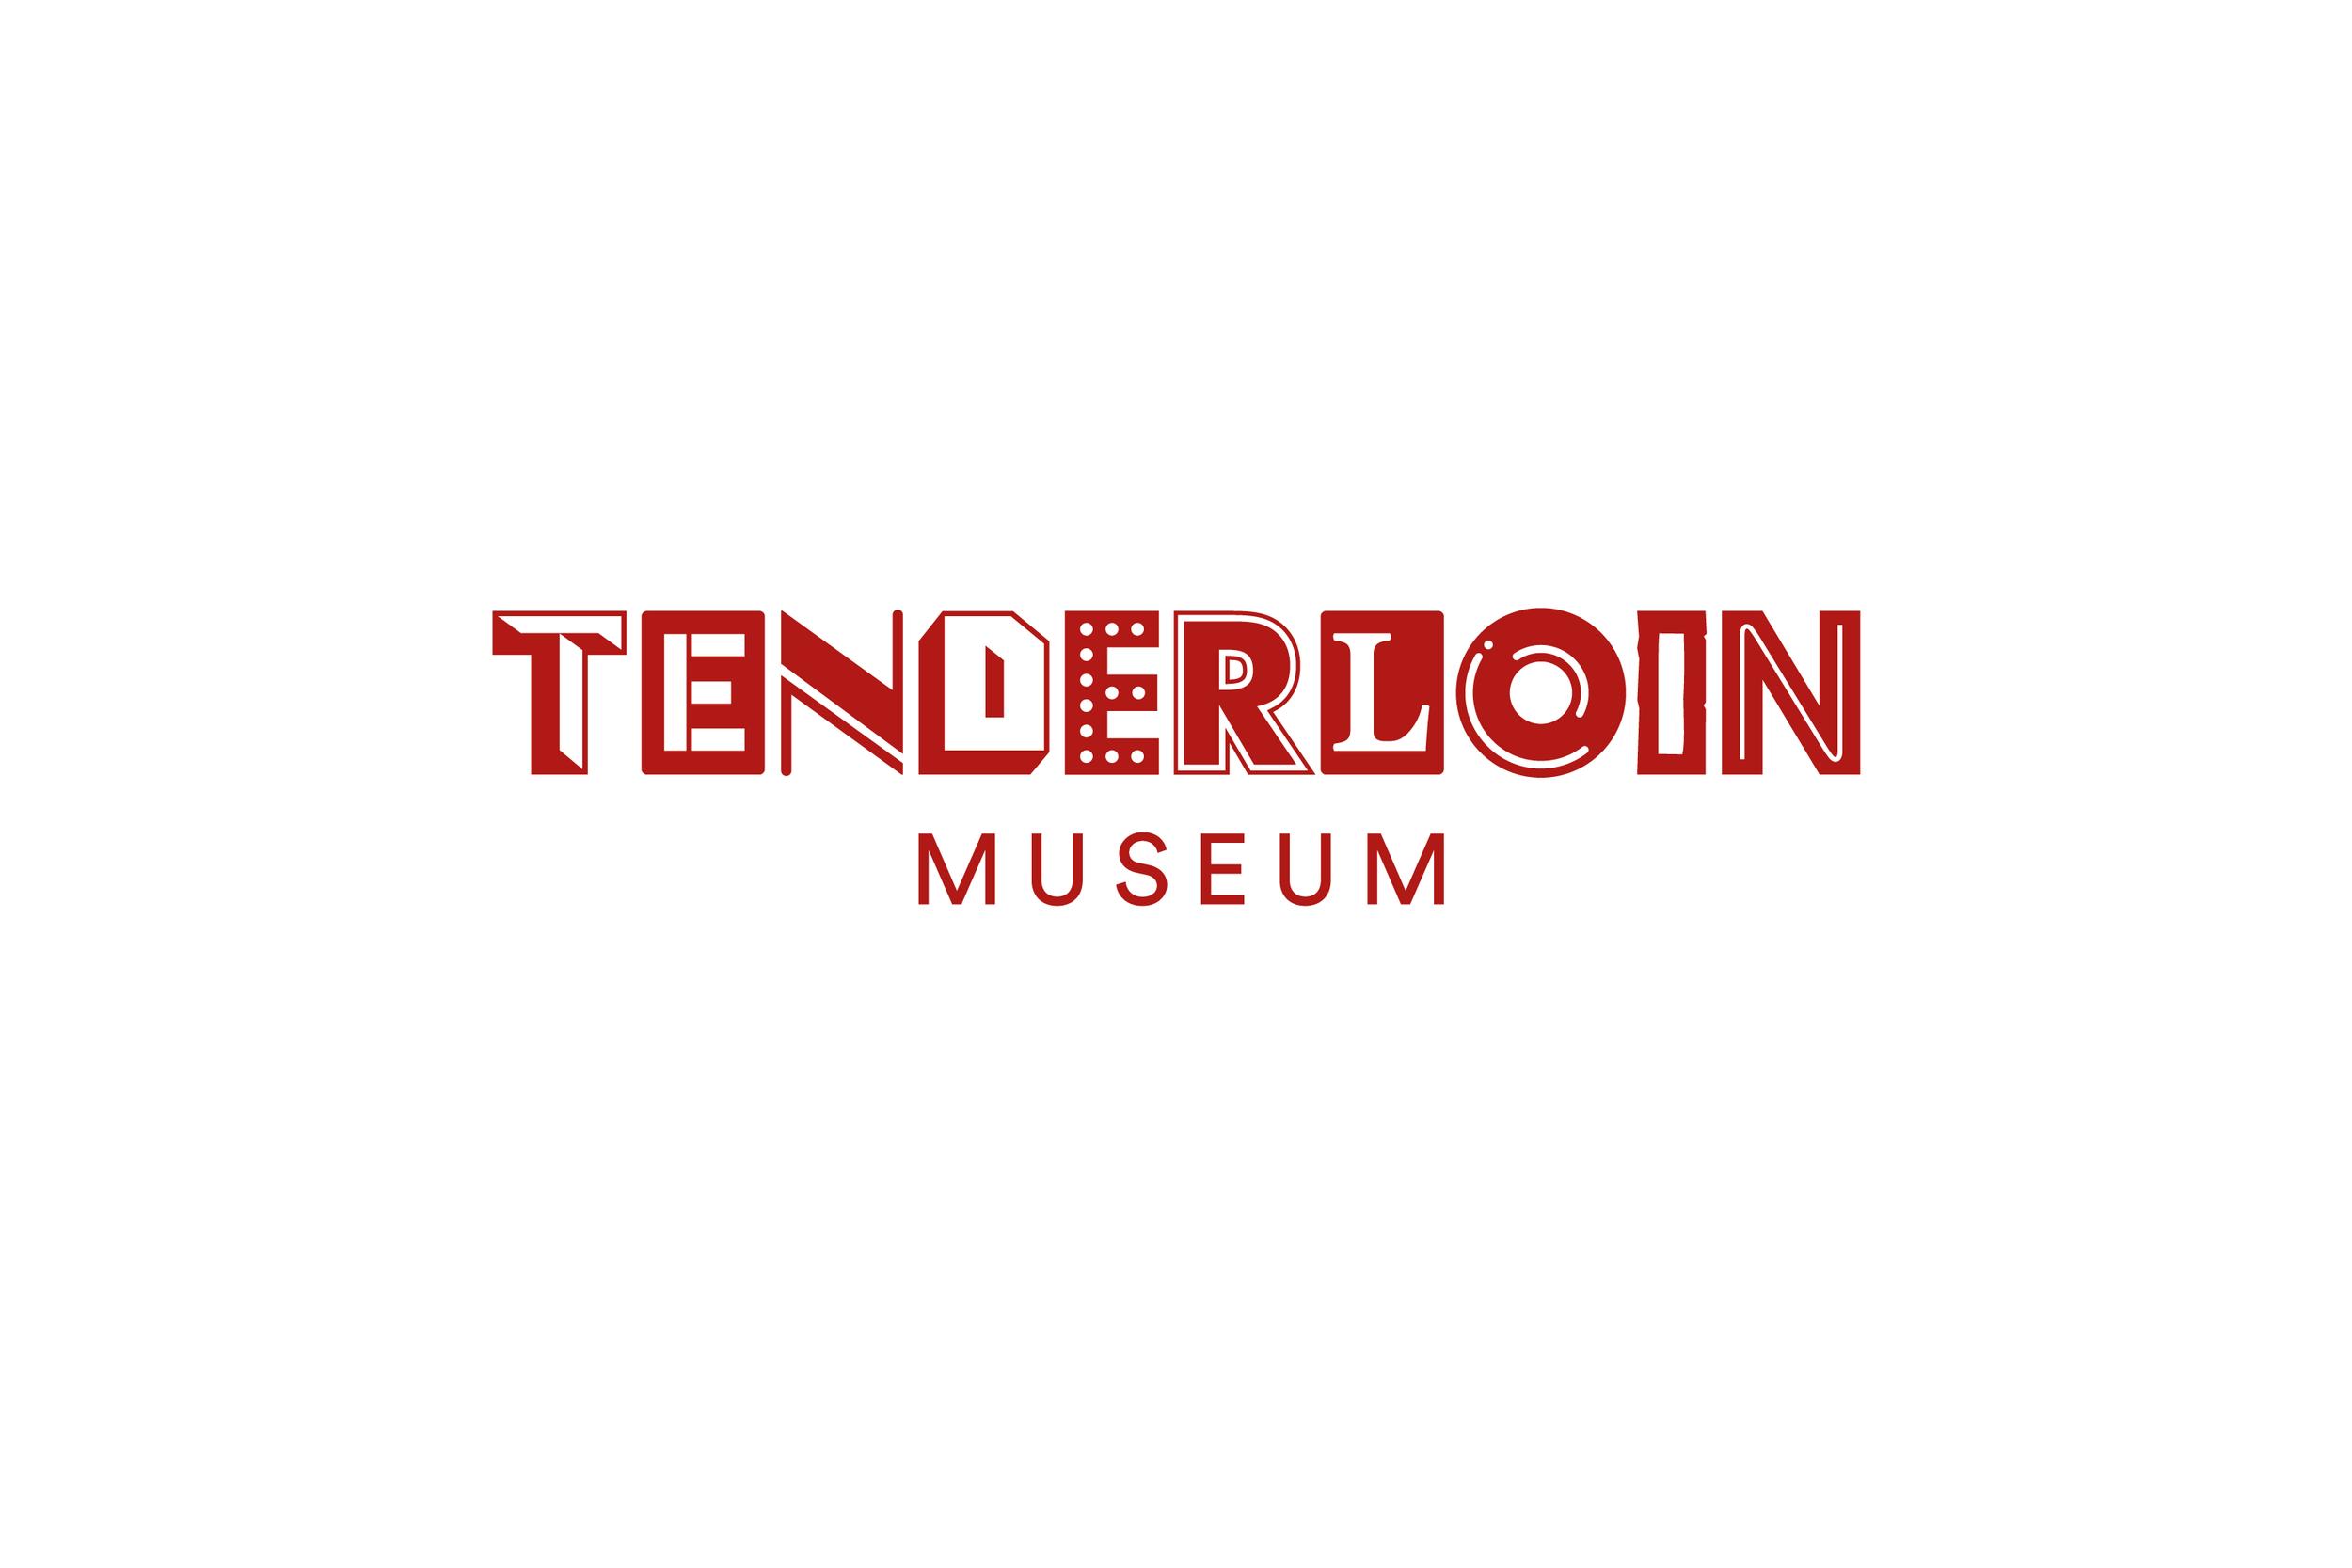 Tenderloin_logo_Large.png